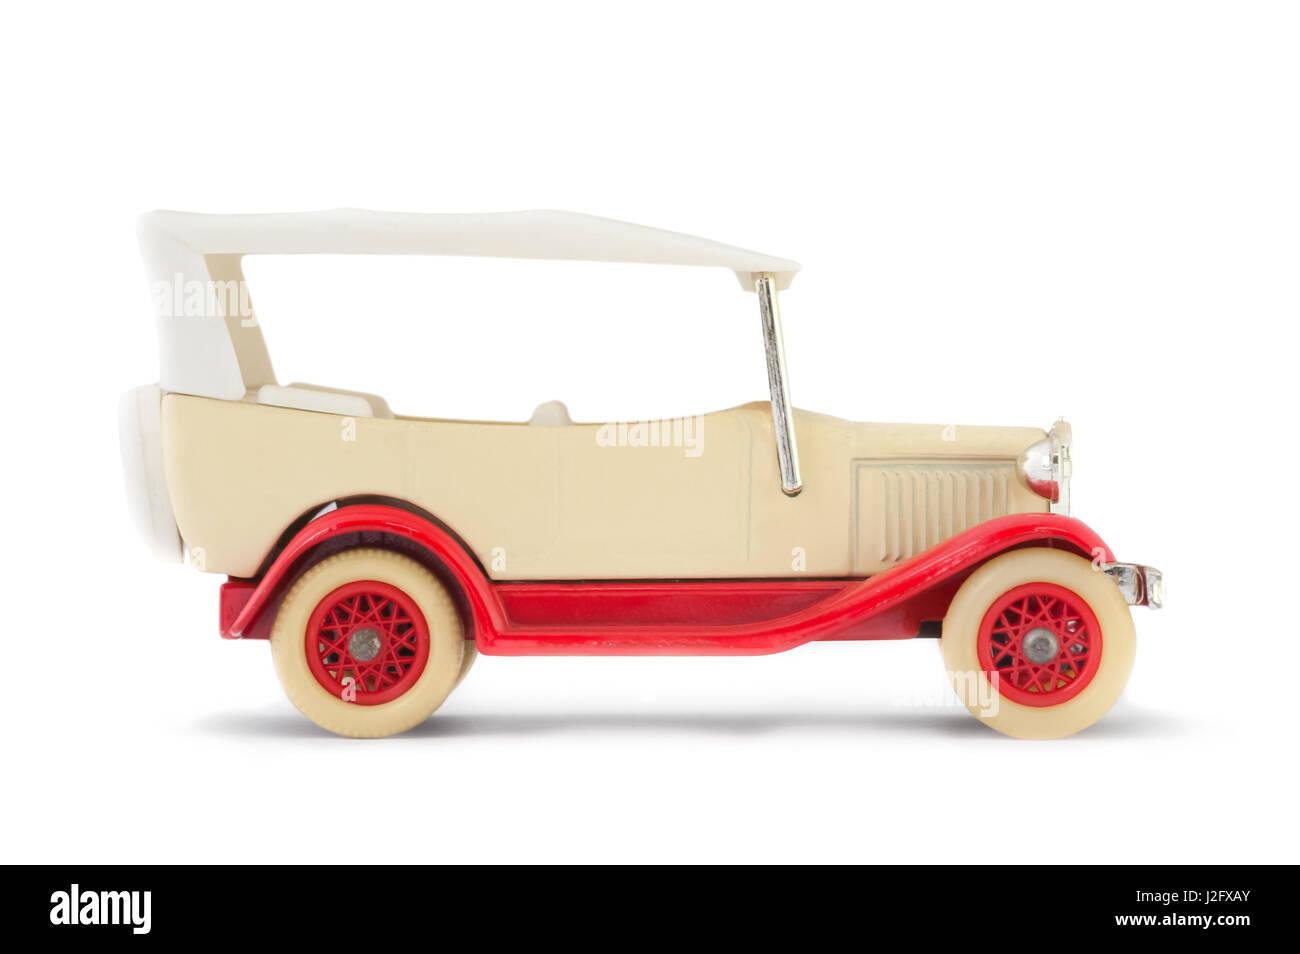 vintage model car isolated on white - Stock Image